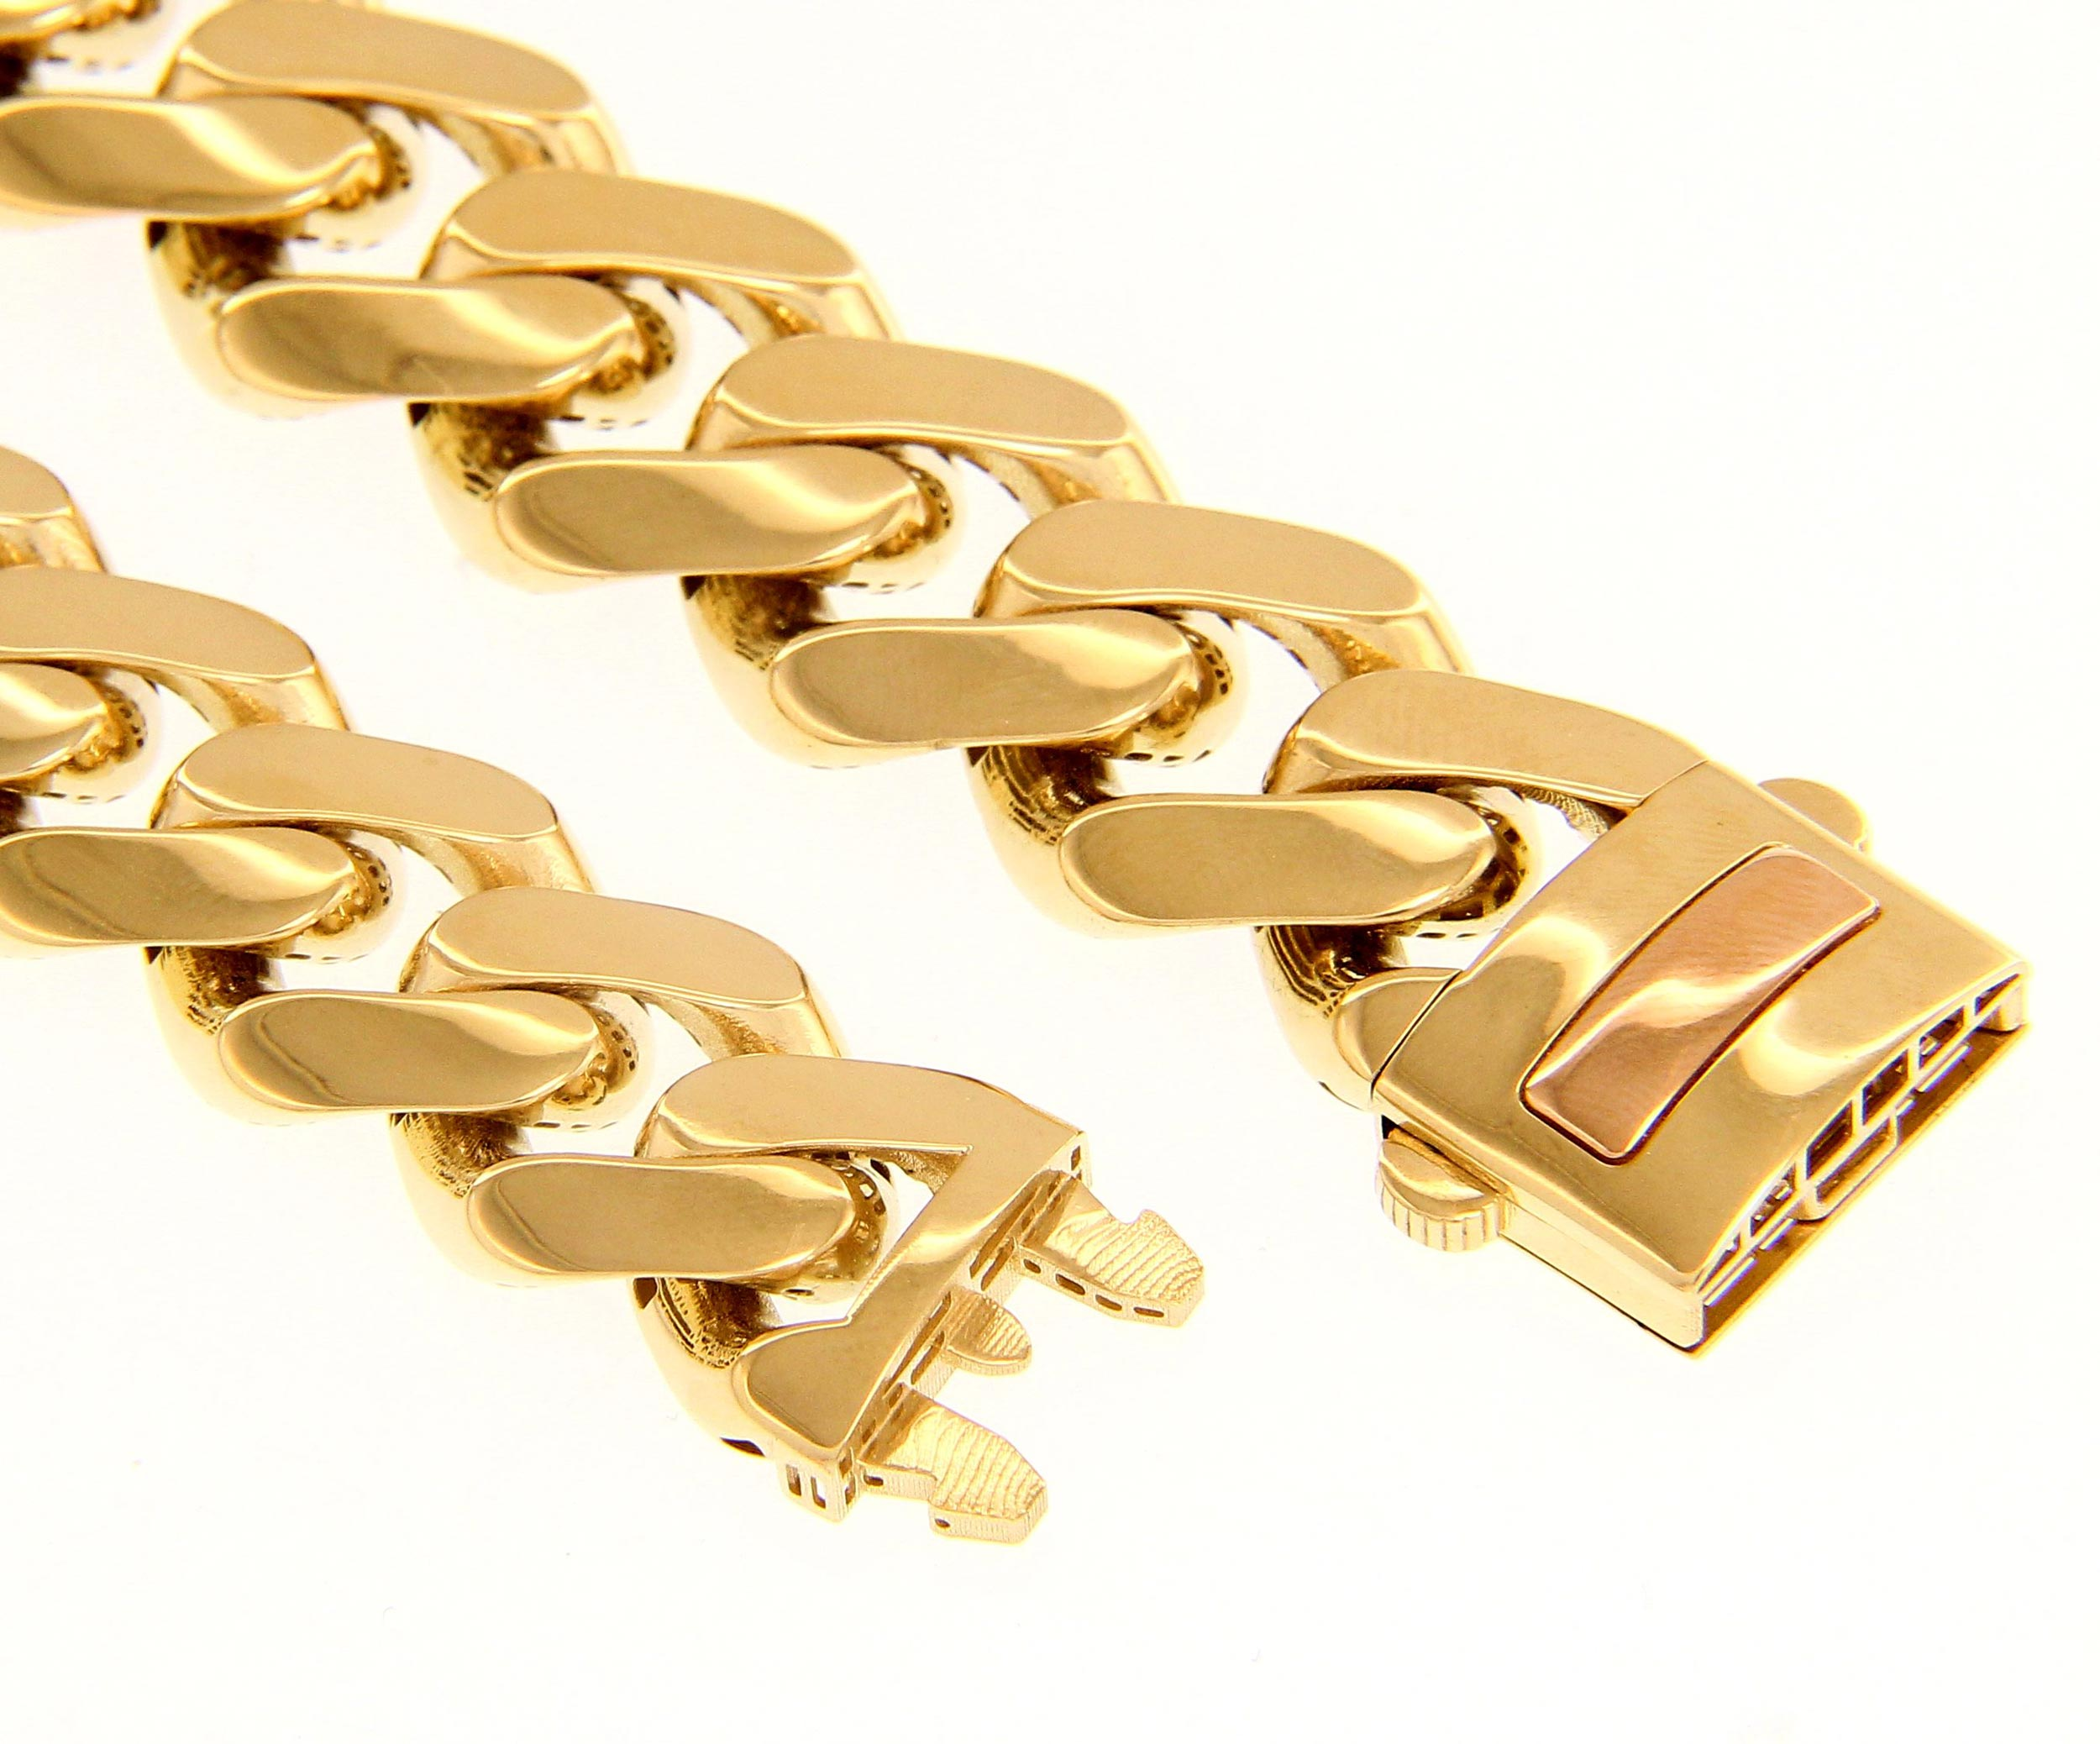 Stylish, Urban 18ct Yellow Gold Filo 1.55 21cm Bracelet